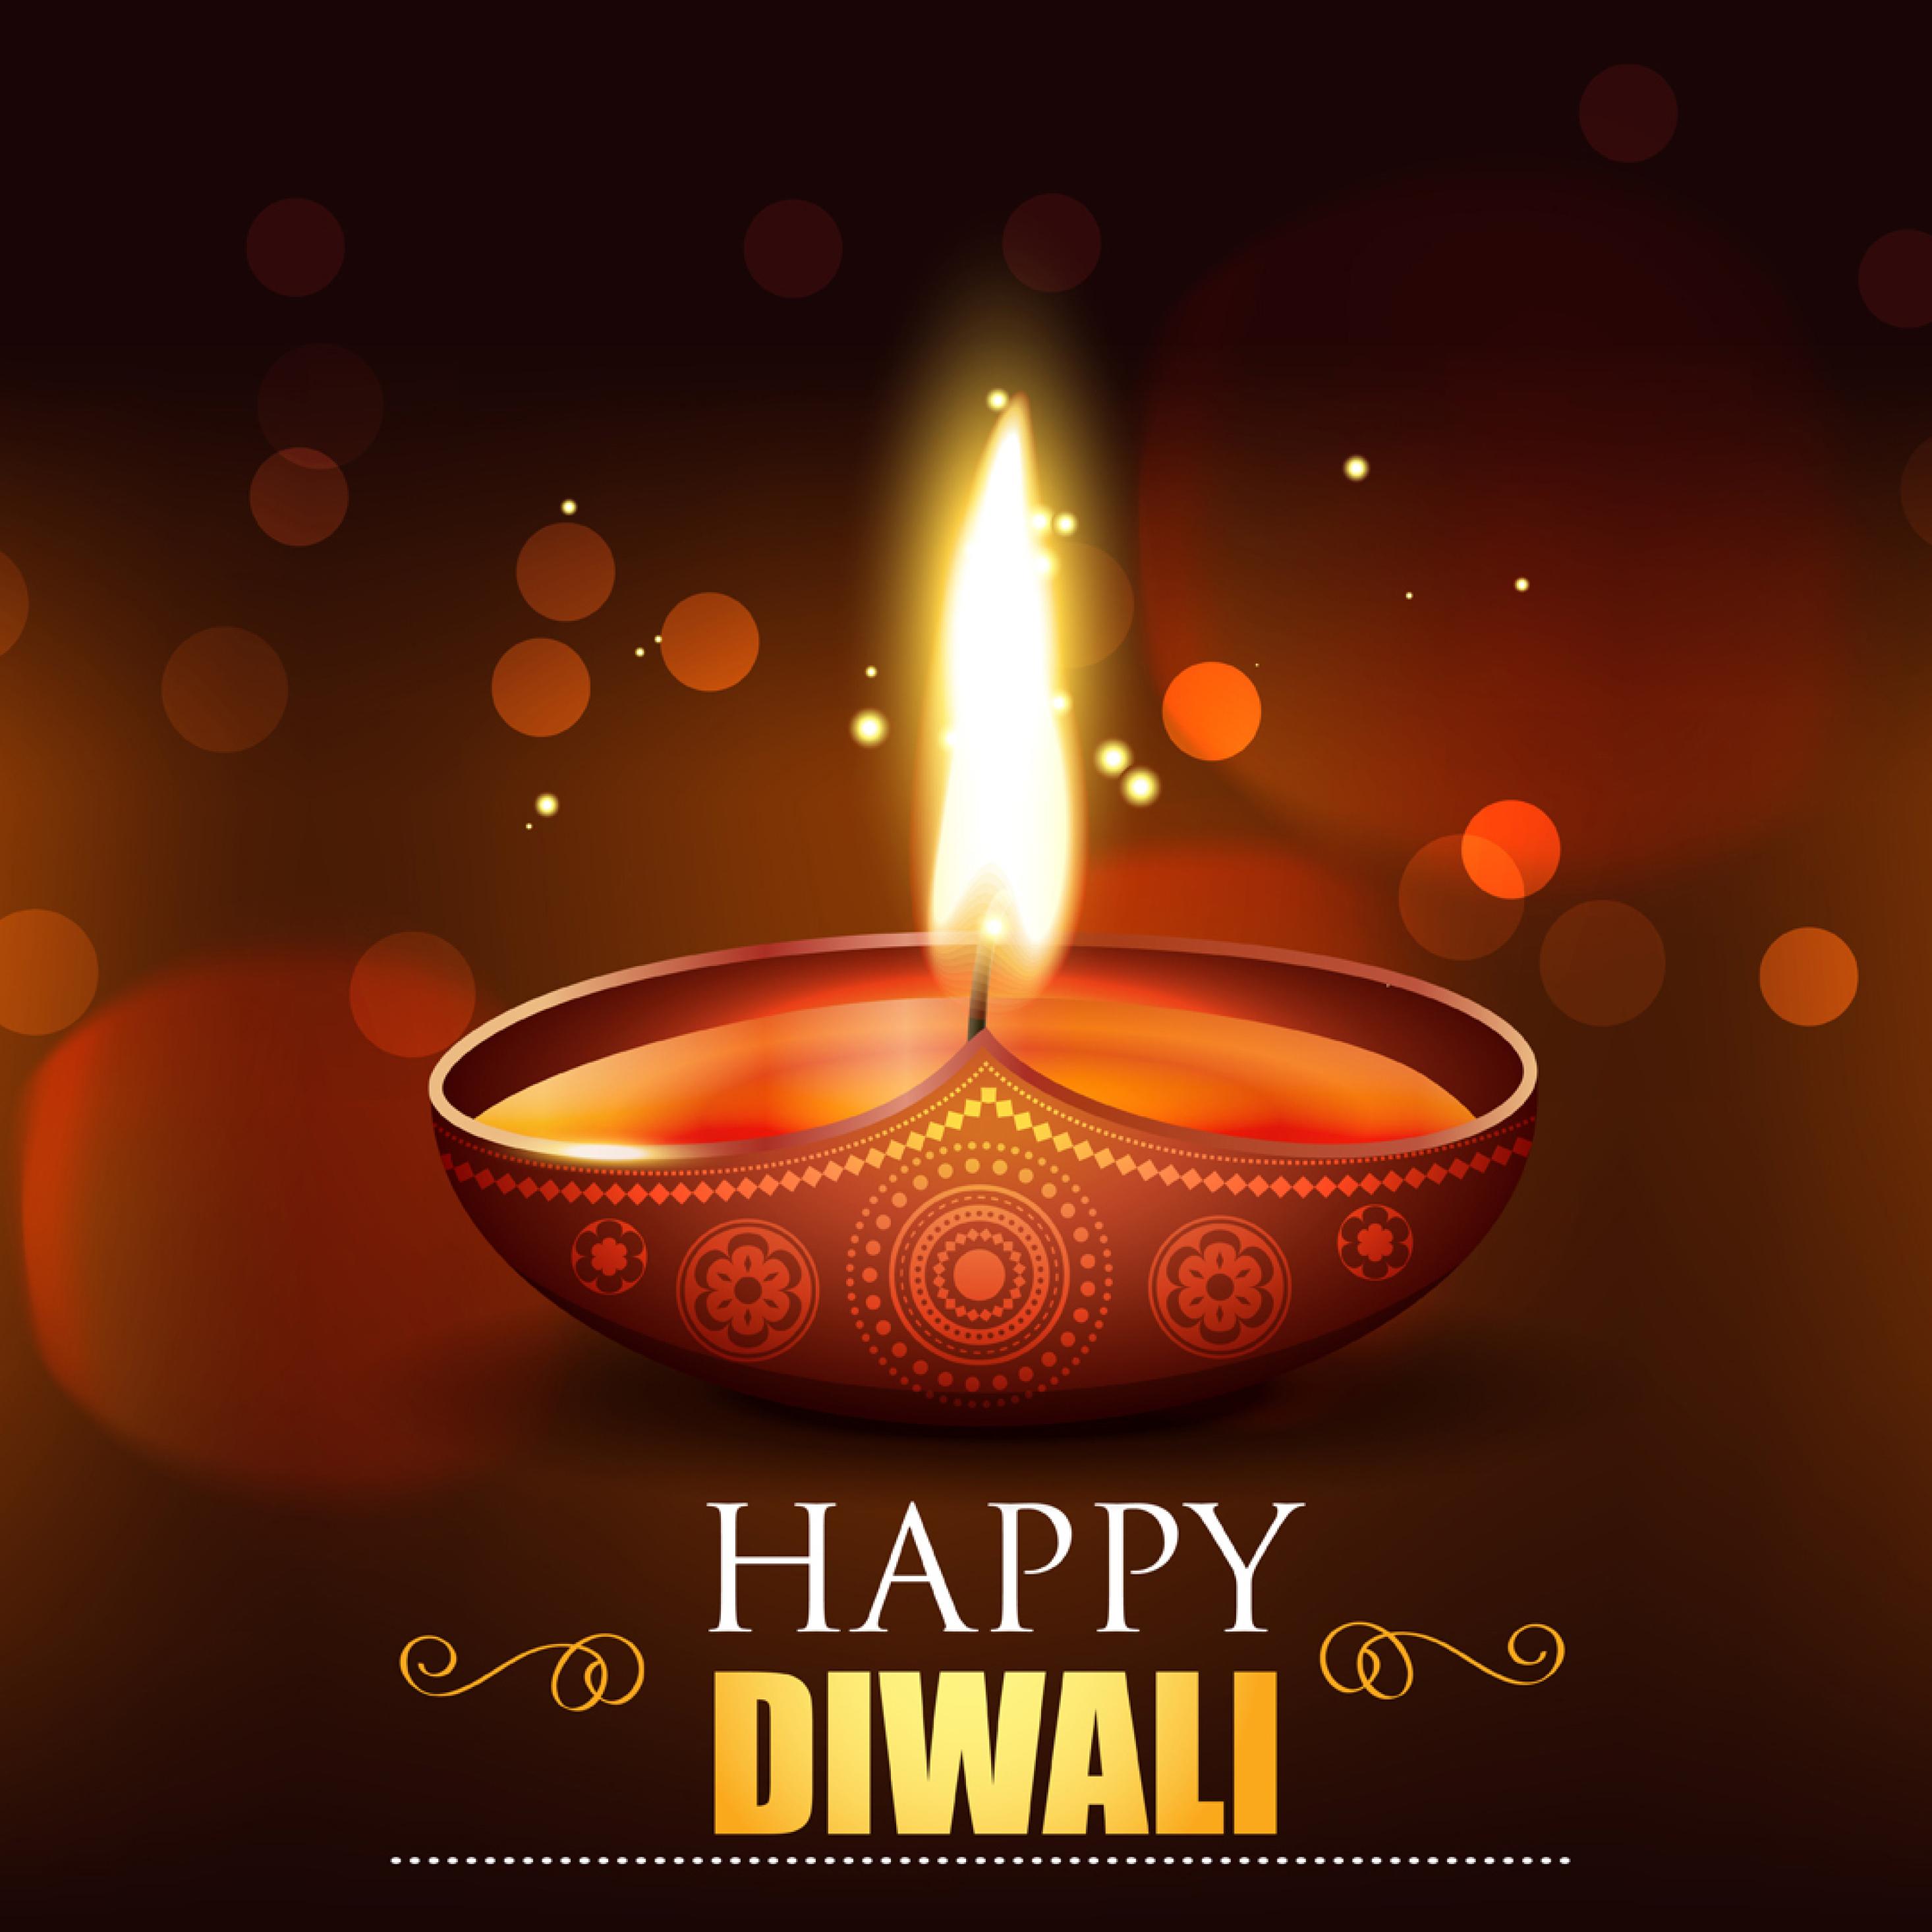 Happy Diwali 2020 Wallpaper in 2932x2932 Resolution